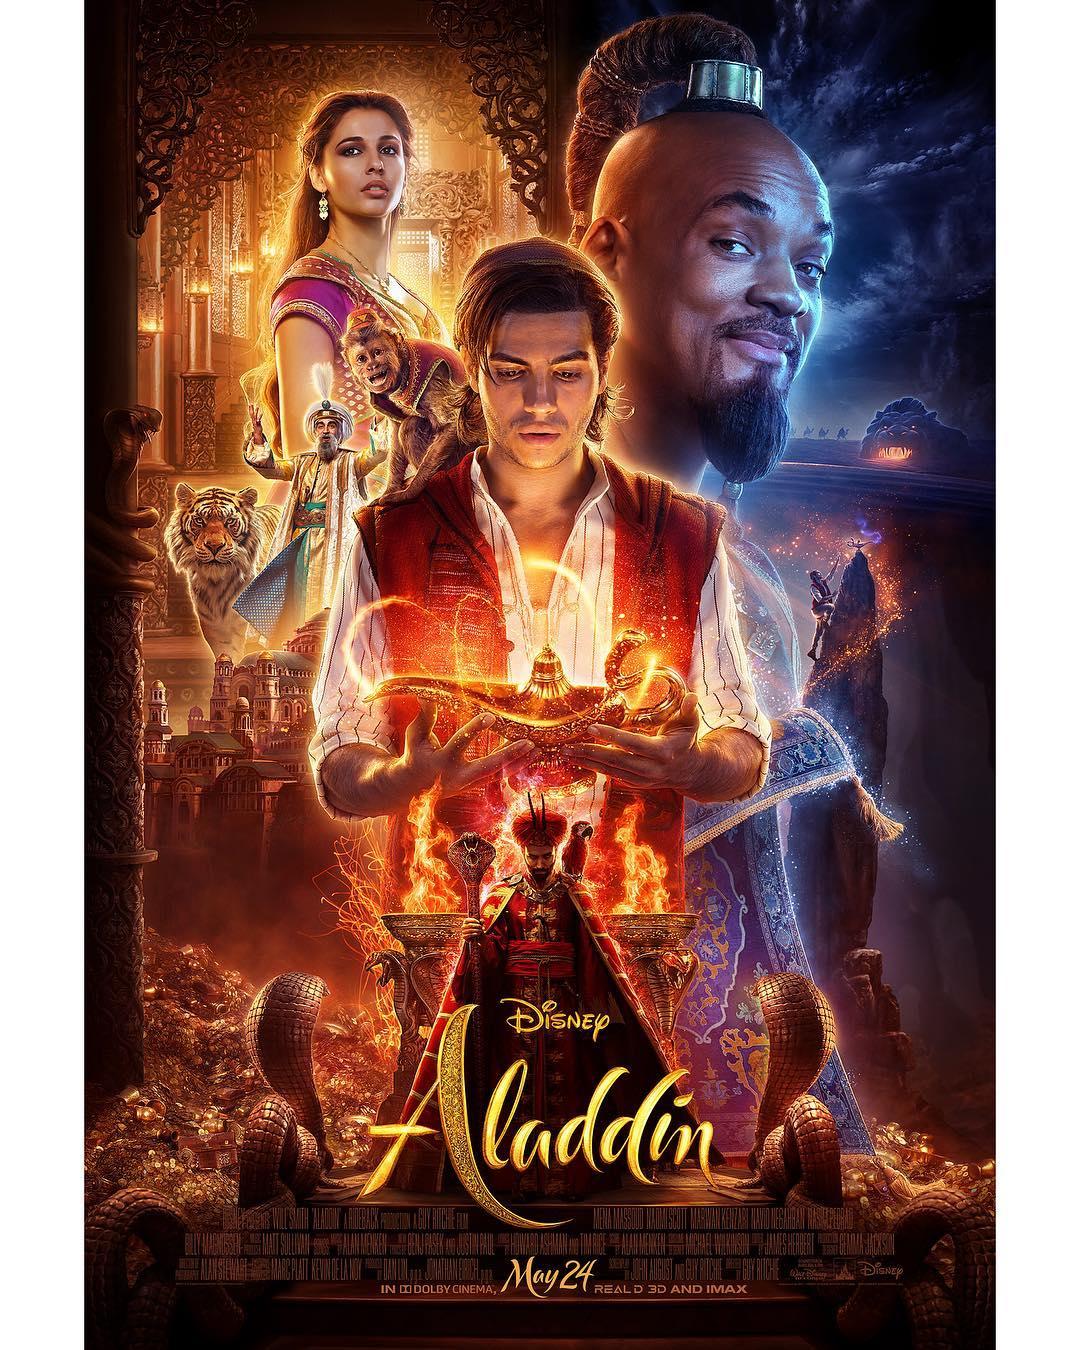 Aladdin-2019-Poster-aladdin-2019-42691233-1080-1350.jpg